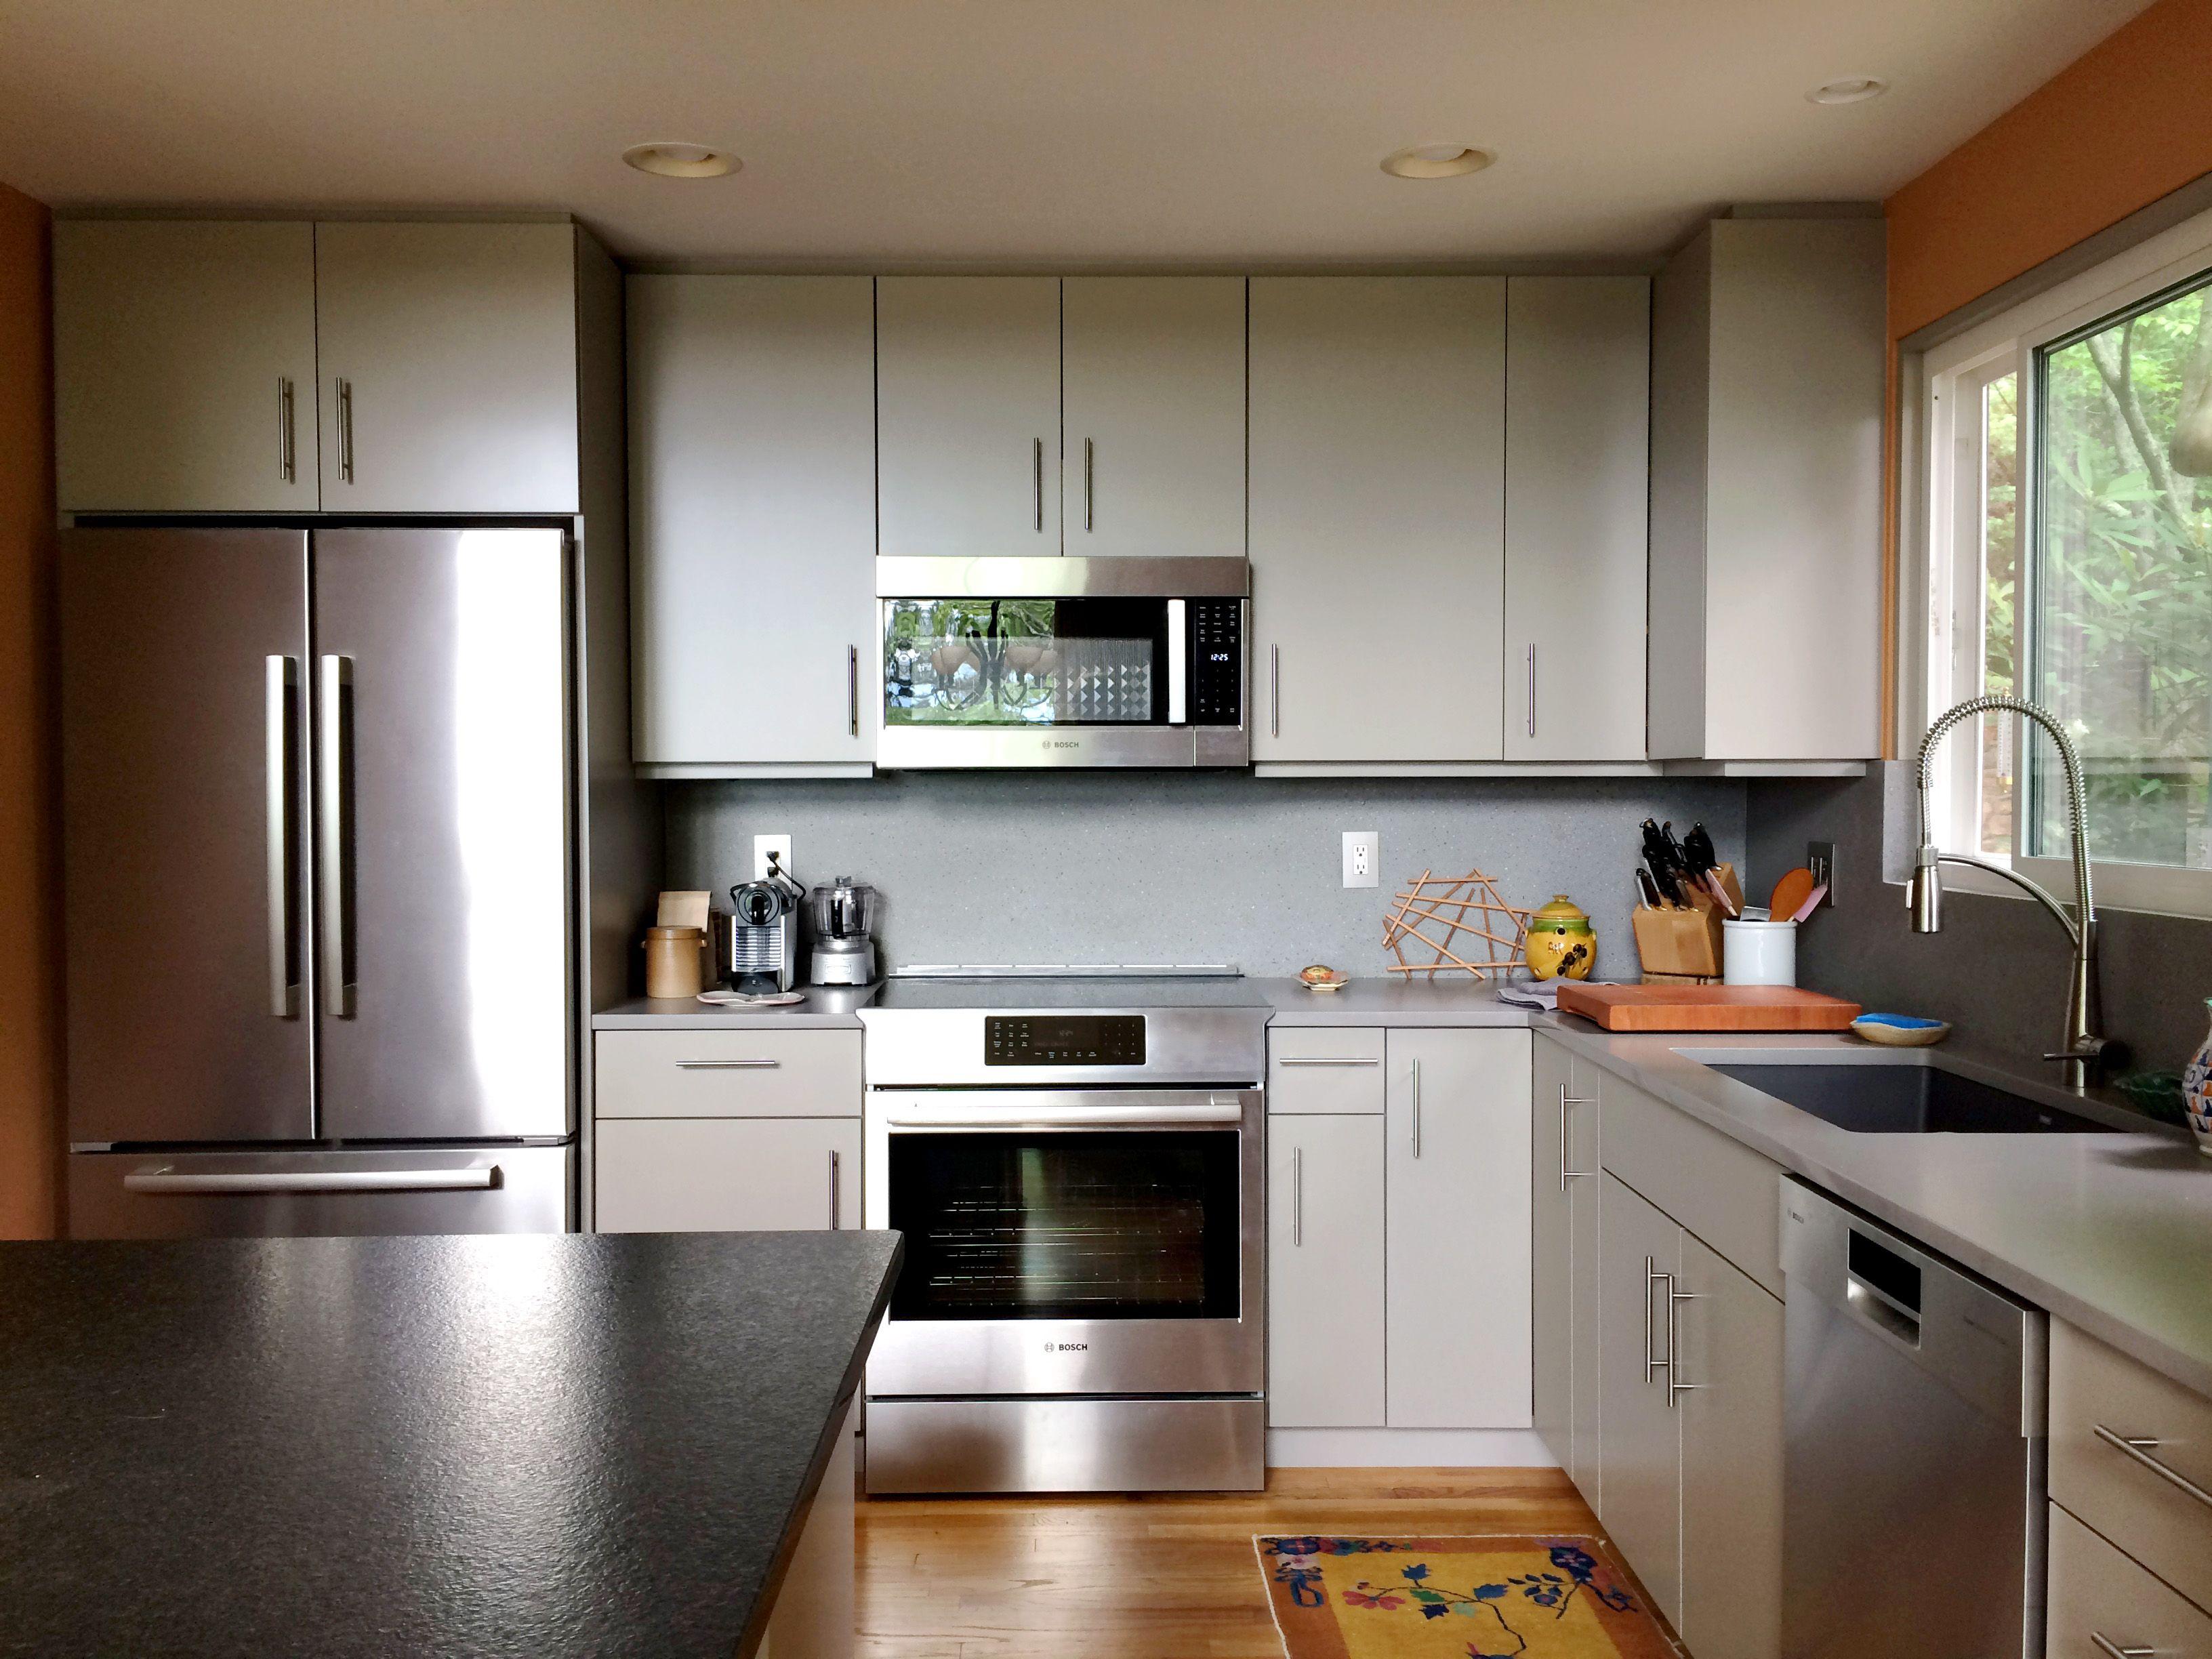 Kenilworth Kitchen 2 Kitchen Decor Kitchen Modular Life Kitchen